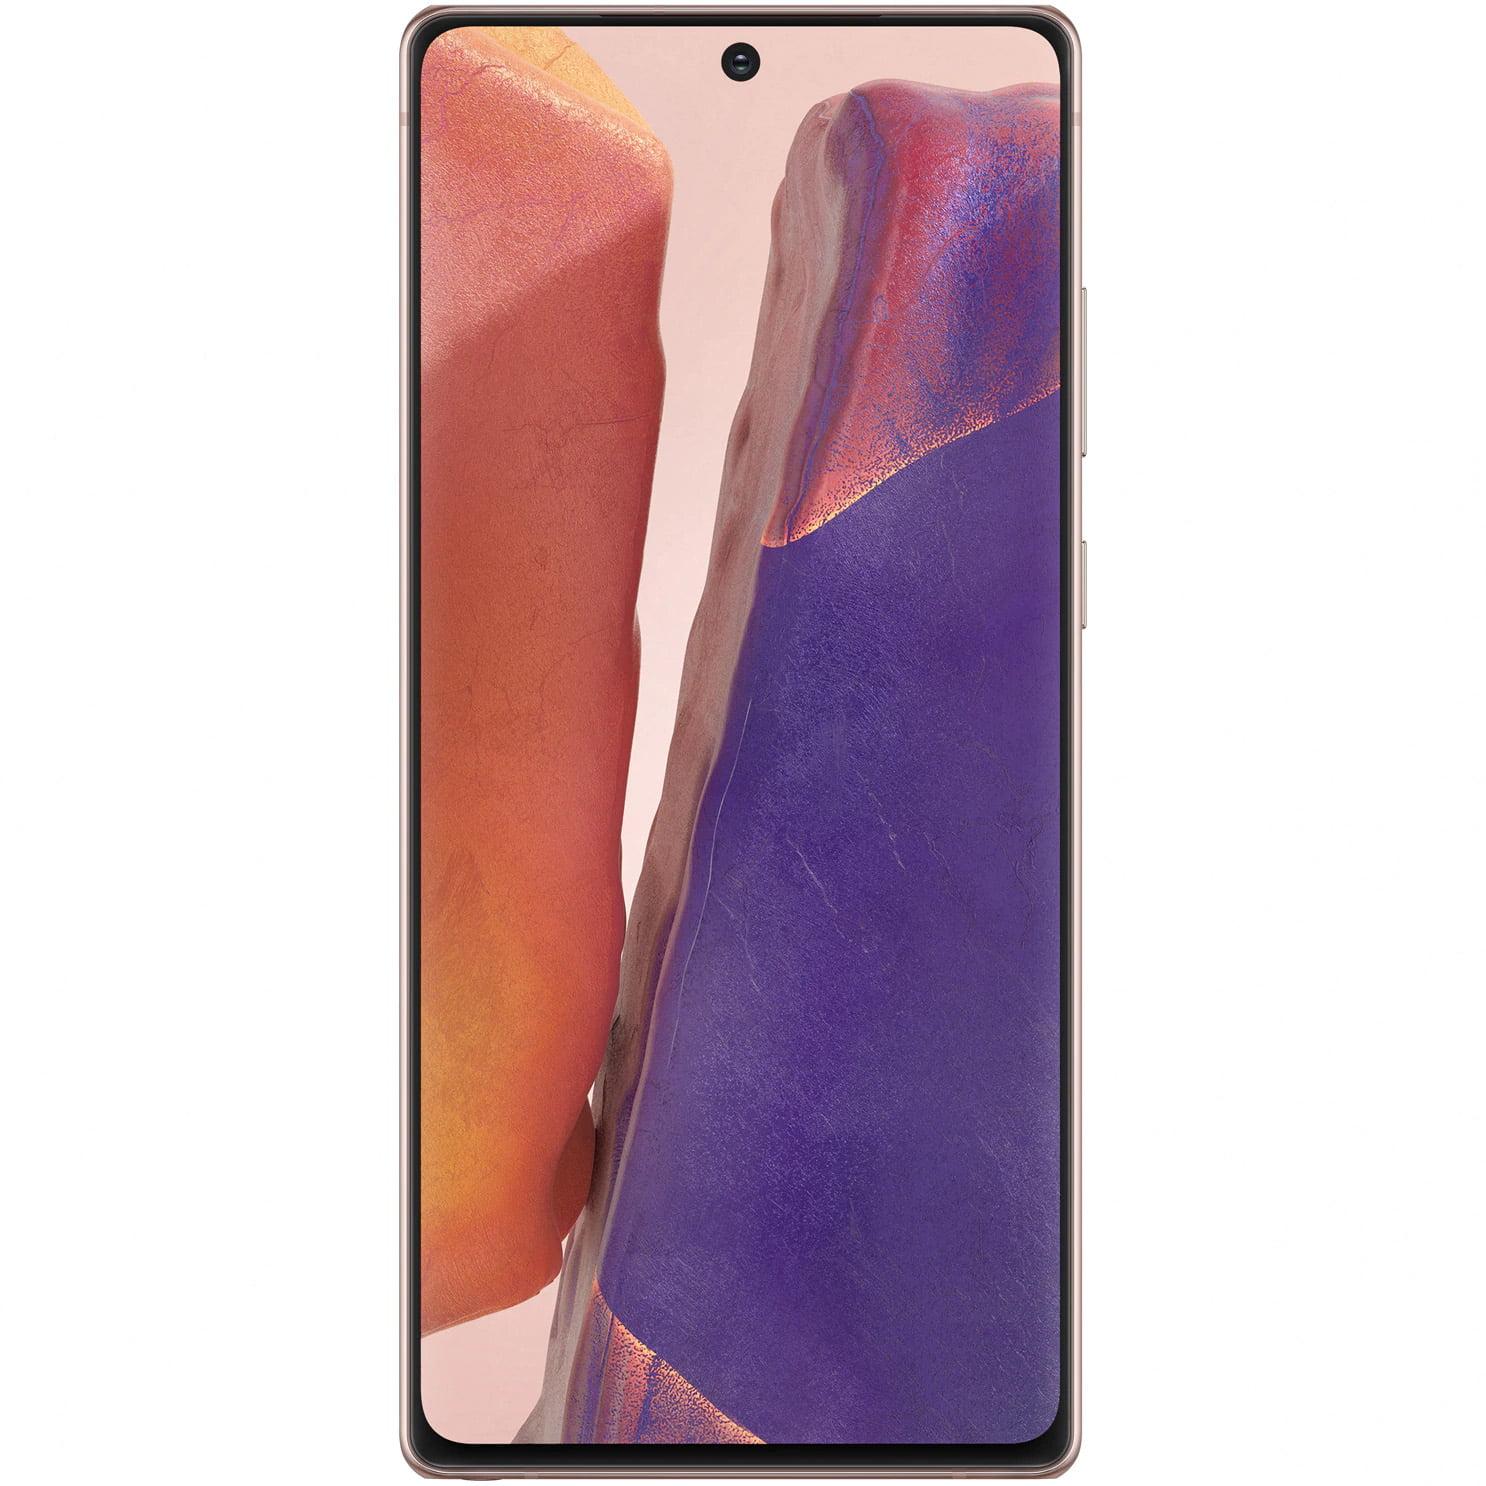 Telefon mobil Samsung Galaxy Note 20, Dual SIM, 256GB, 8GB RAM, 5G, Mystic Bronze